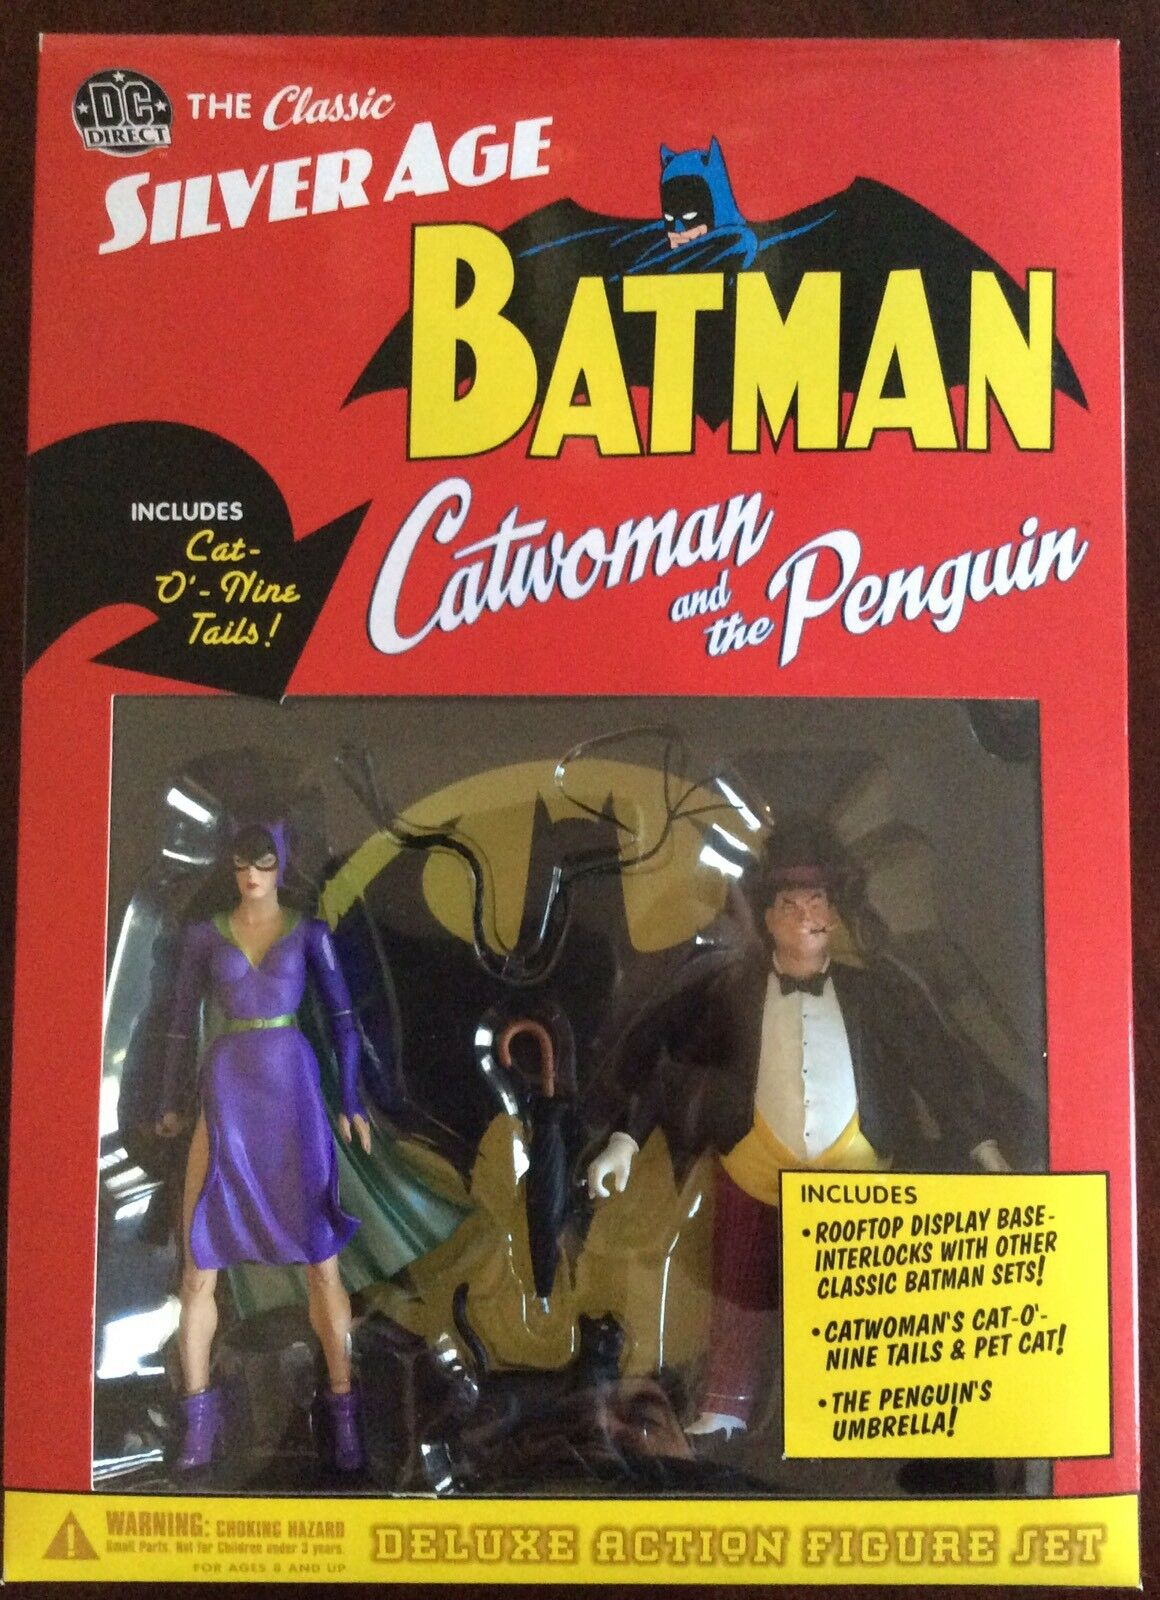 DC Direct argento Age Catdonna e The Penguin  BRe nuovo IN scatola  Deluxe Set